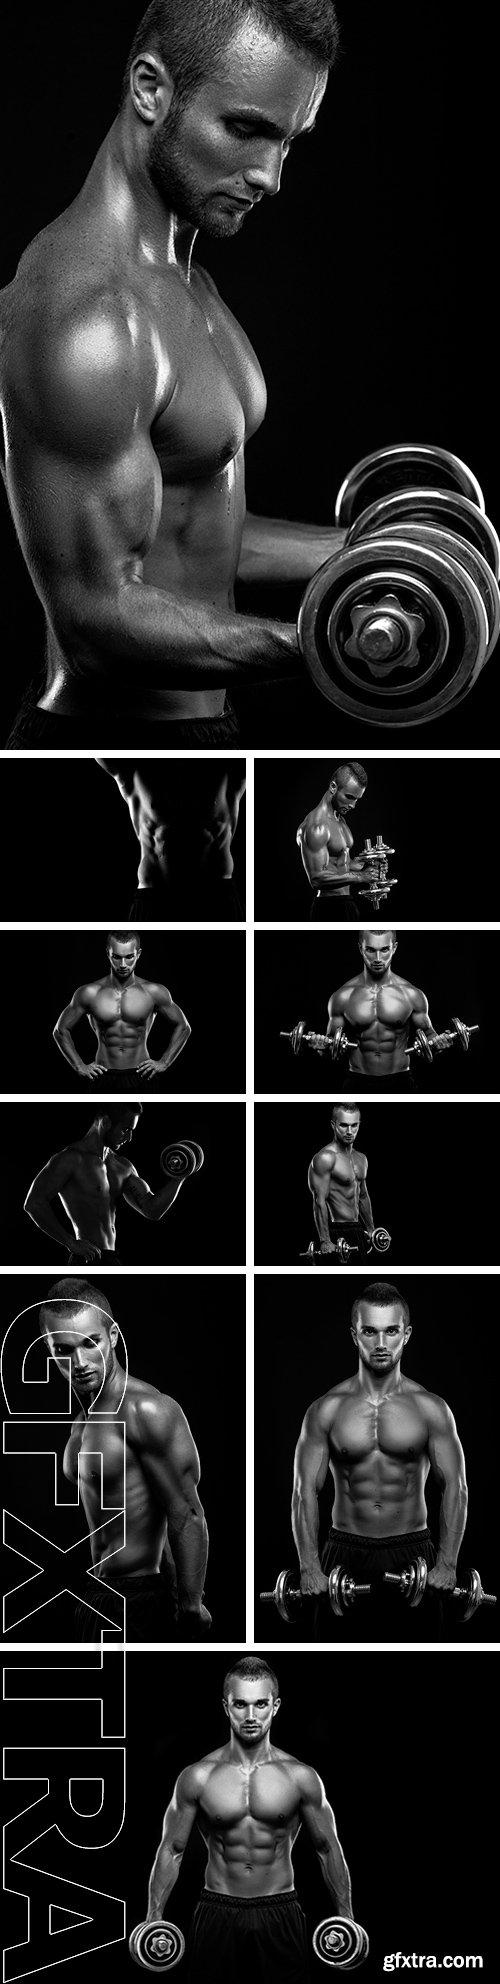 Stock Photos - Bodybuilder on a black background